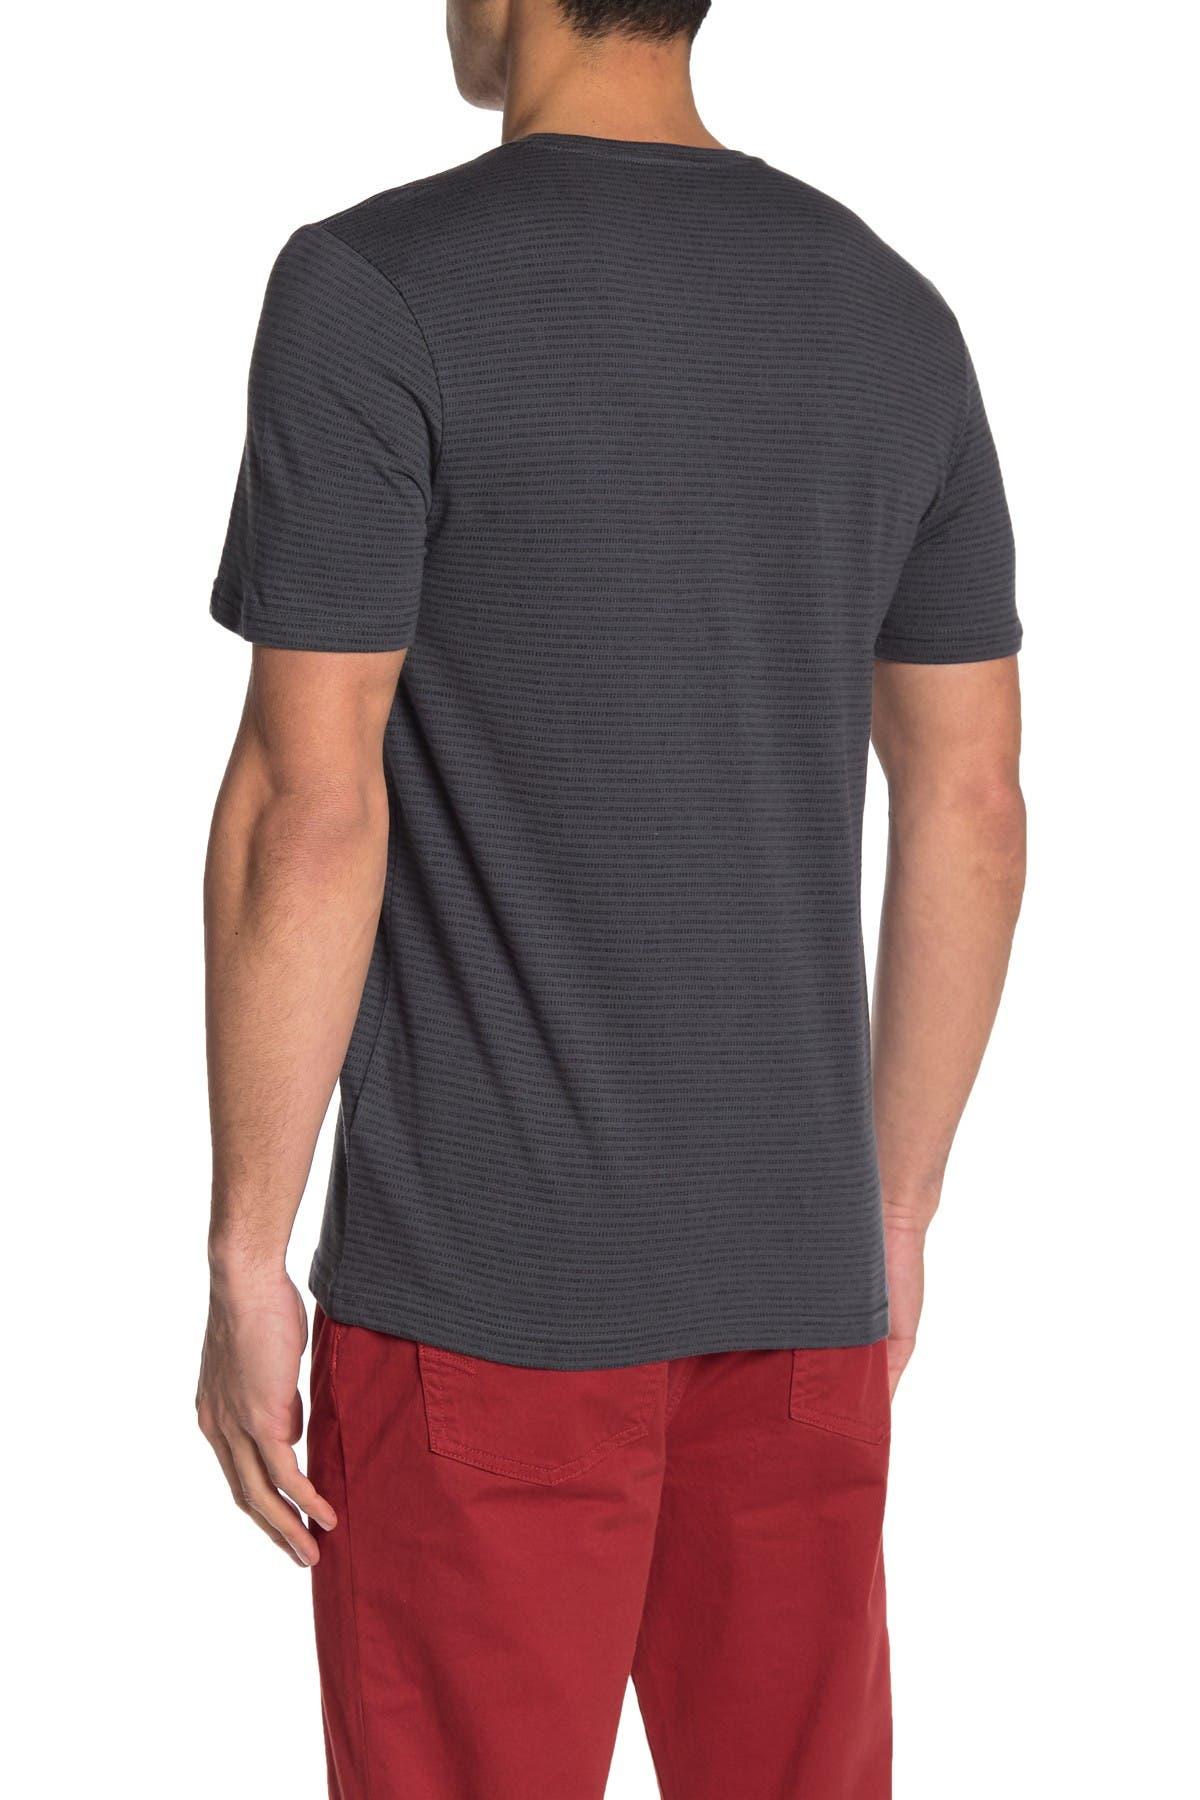 Public Opinion Short Sleeve Striped Pocket T-Shirt